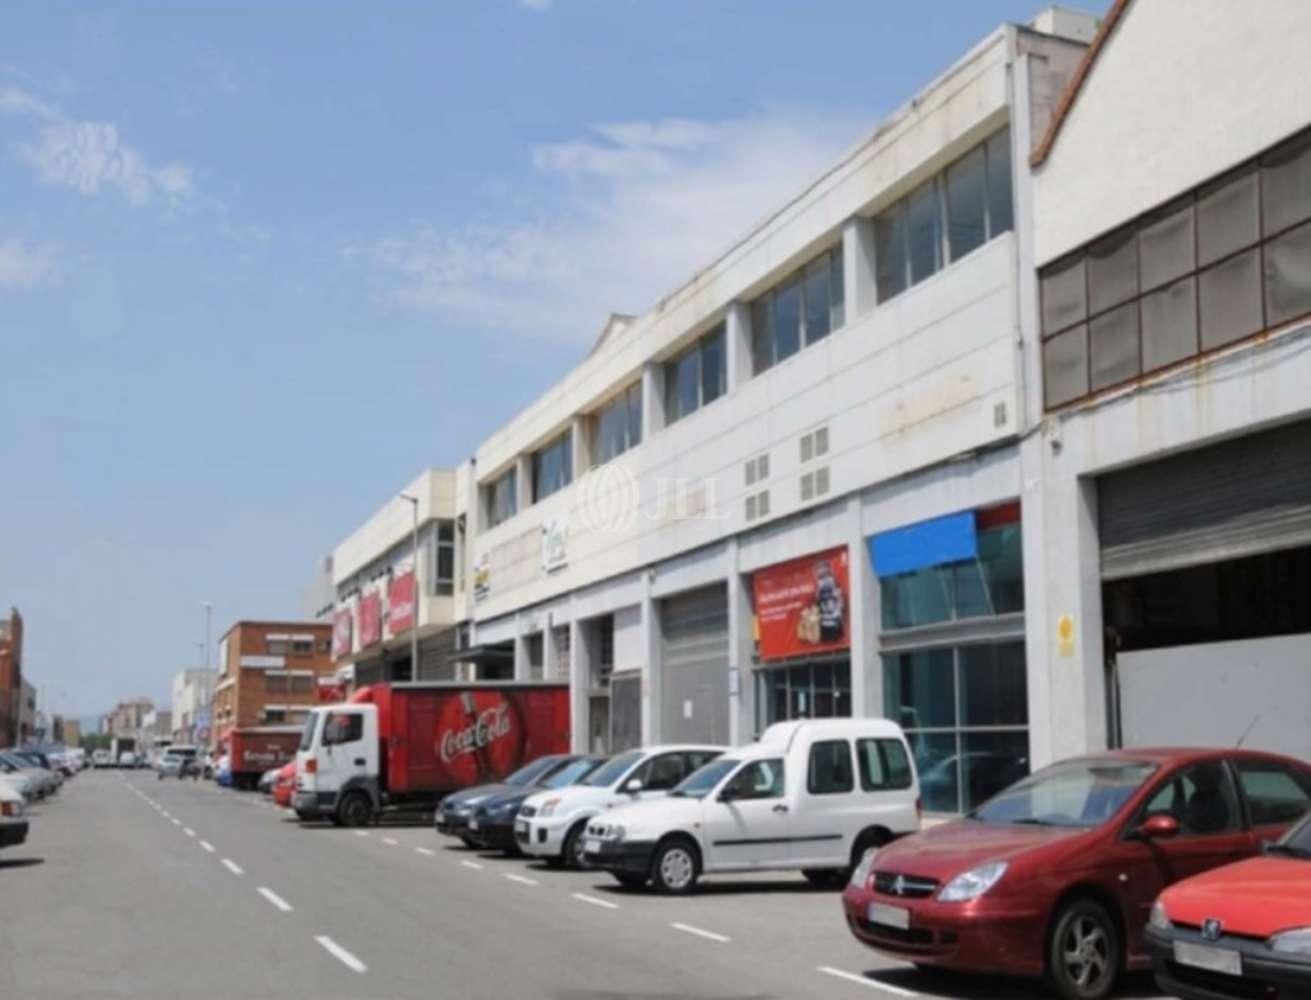 Naves industriales y logísticas L'hospitalet de llobregat, 08907 - Nave Industrial - B0046 - PI ALMEDA - 2880